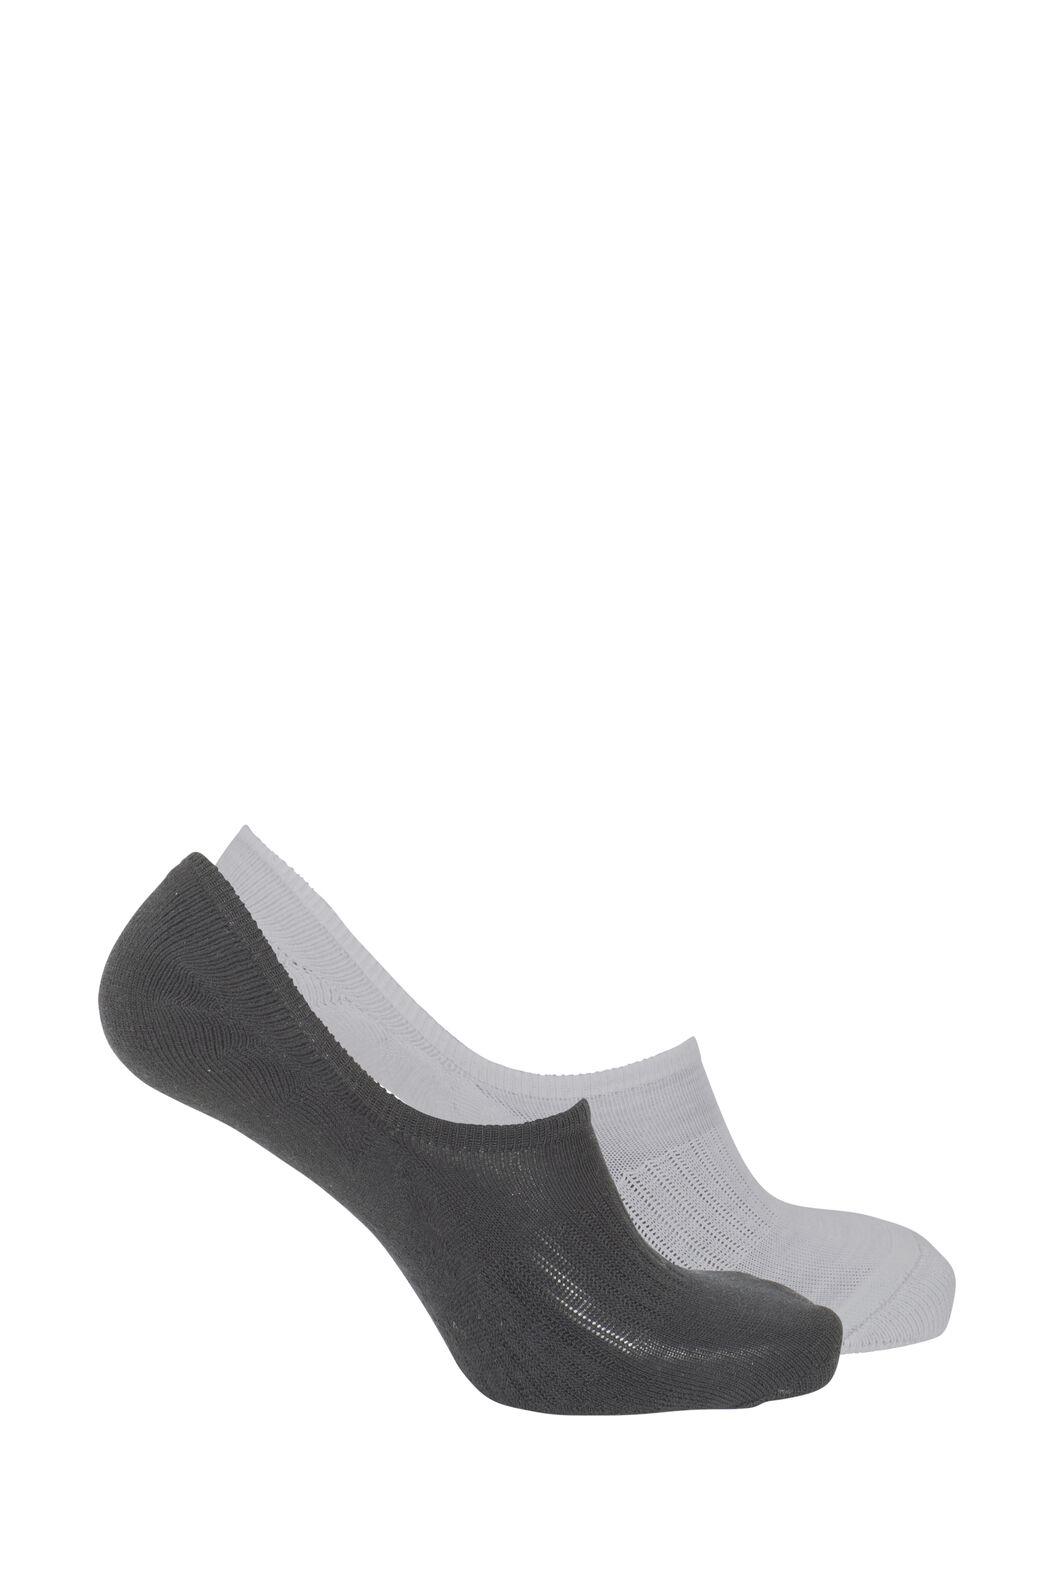 Macpac Invisible Merino Socks — 2 Pack, Black/Grey Marle, hi-res